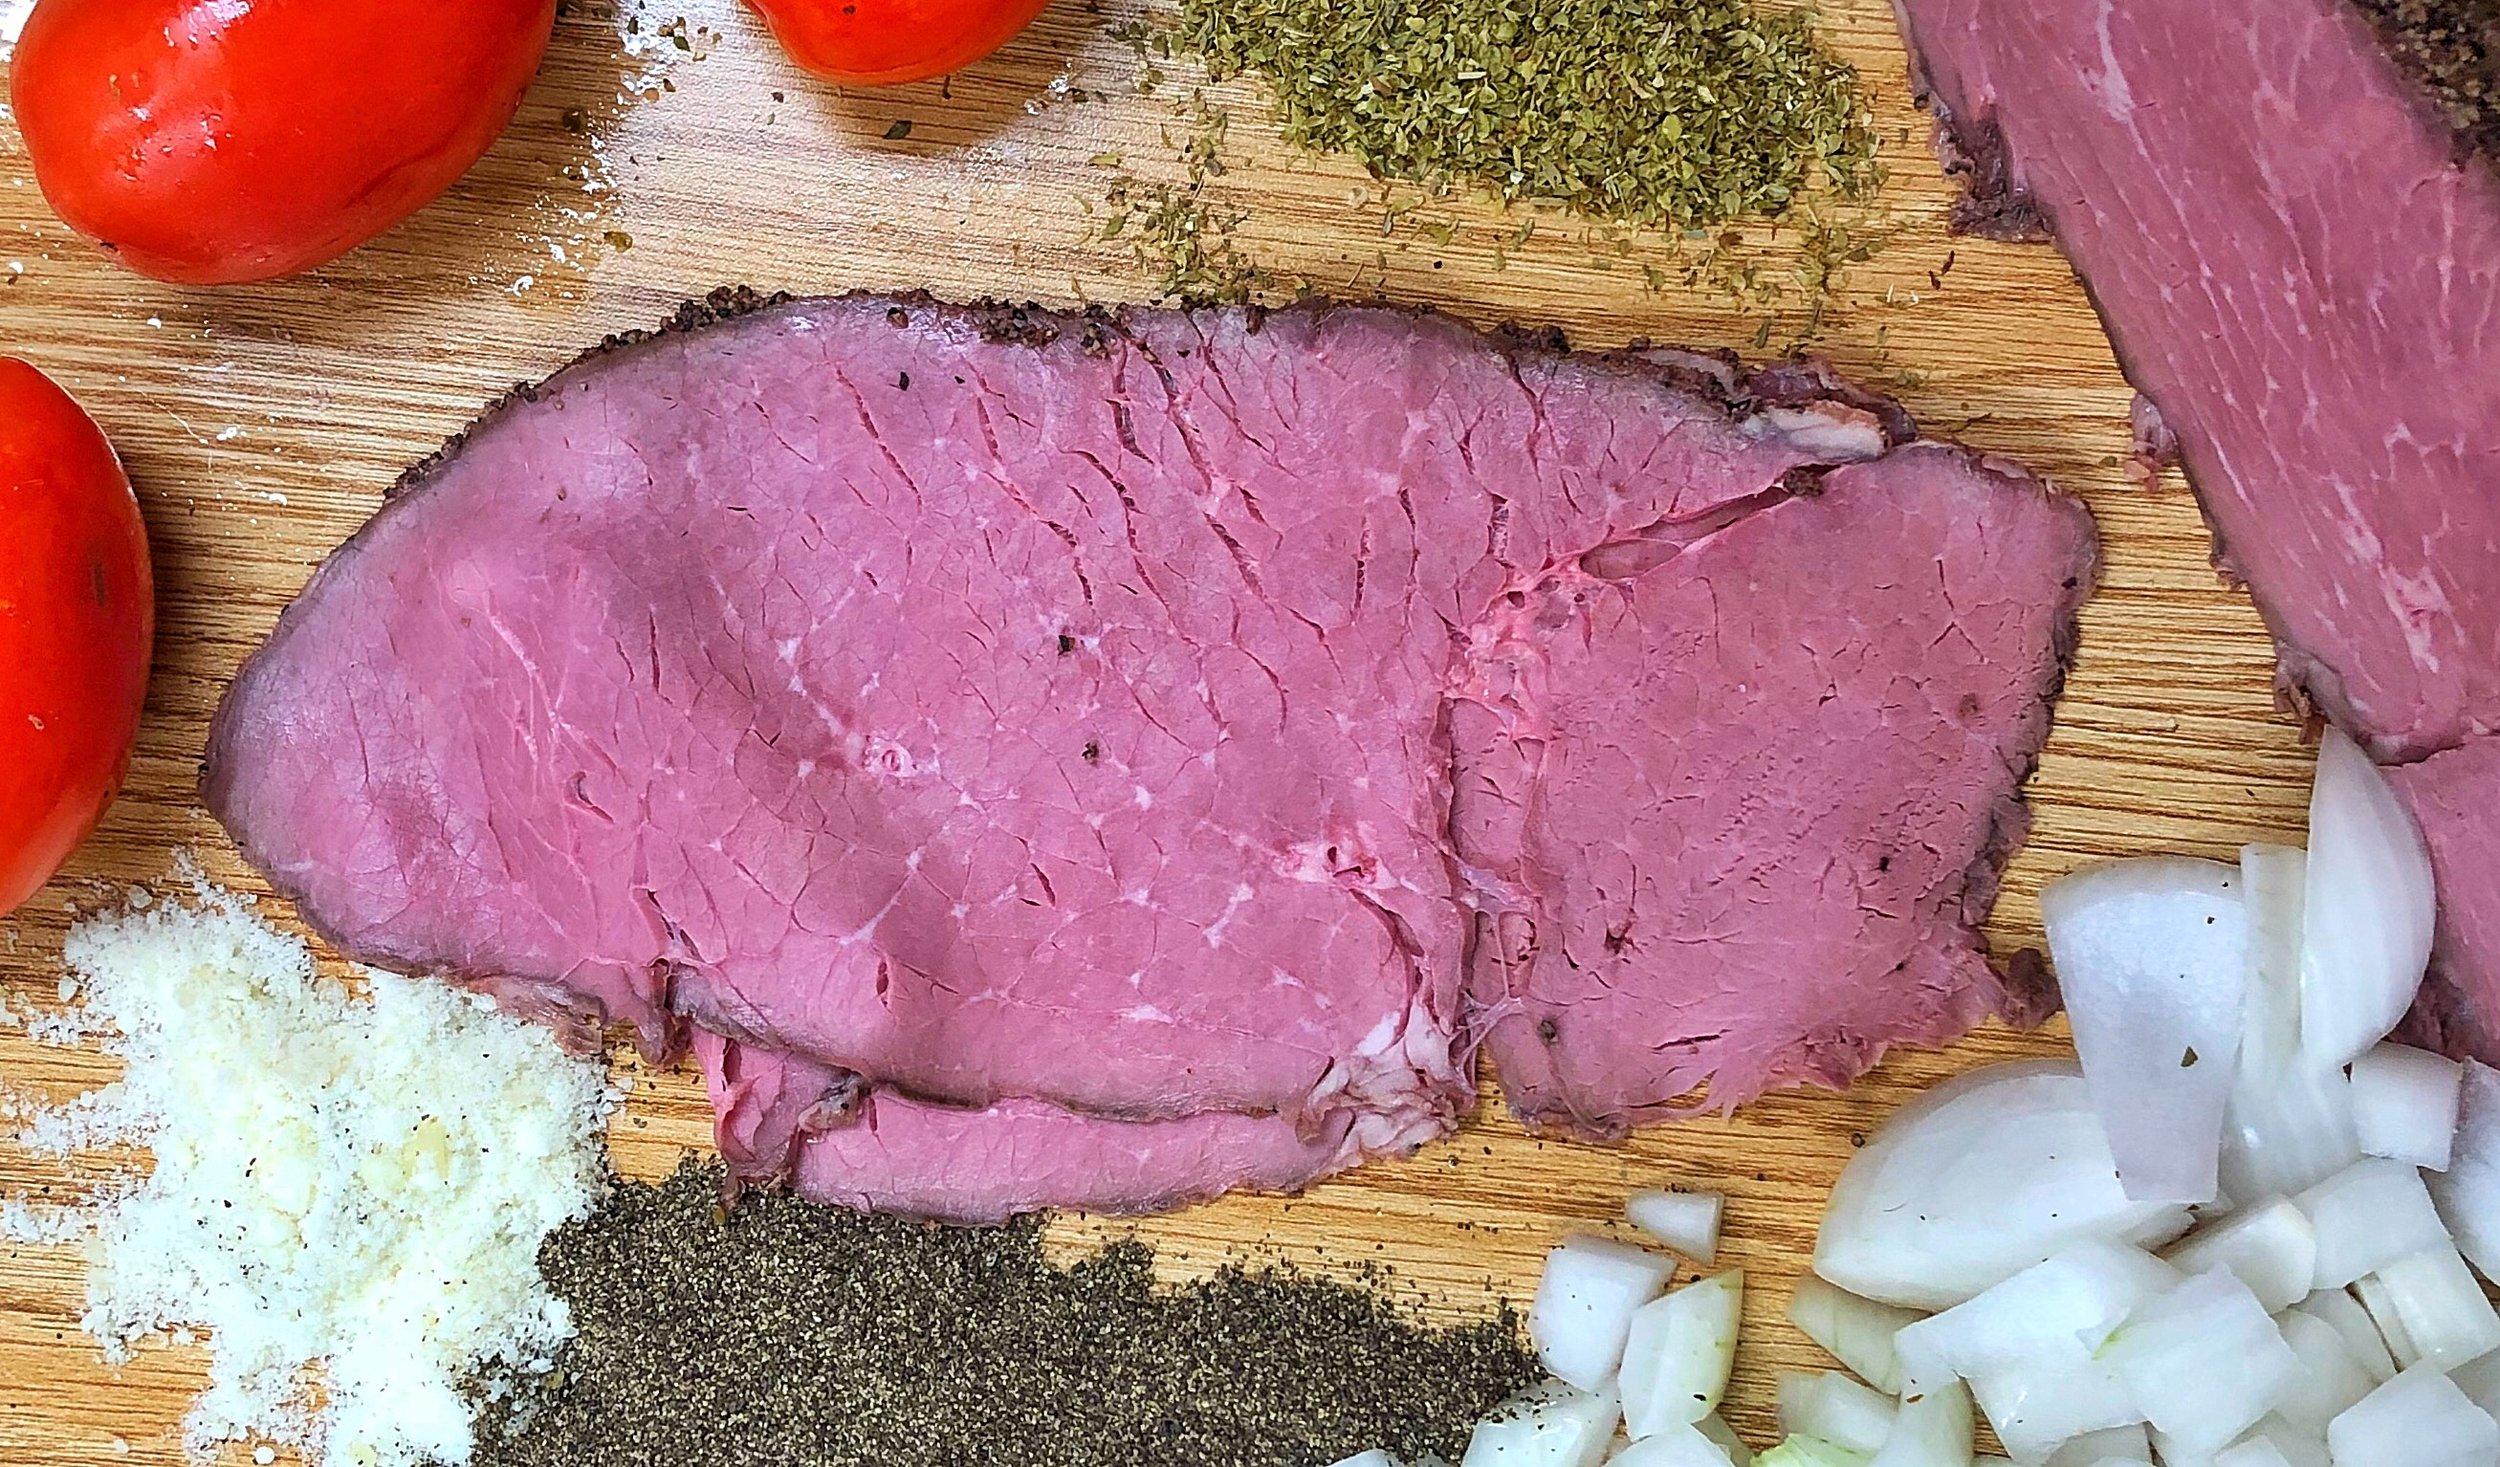 Roast Beef - $12.99 Per Pound